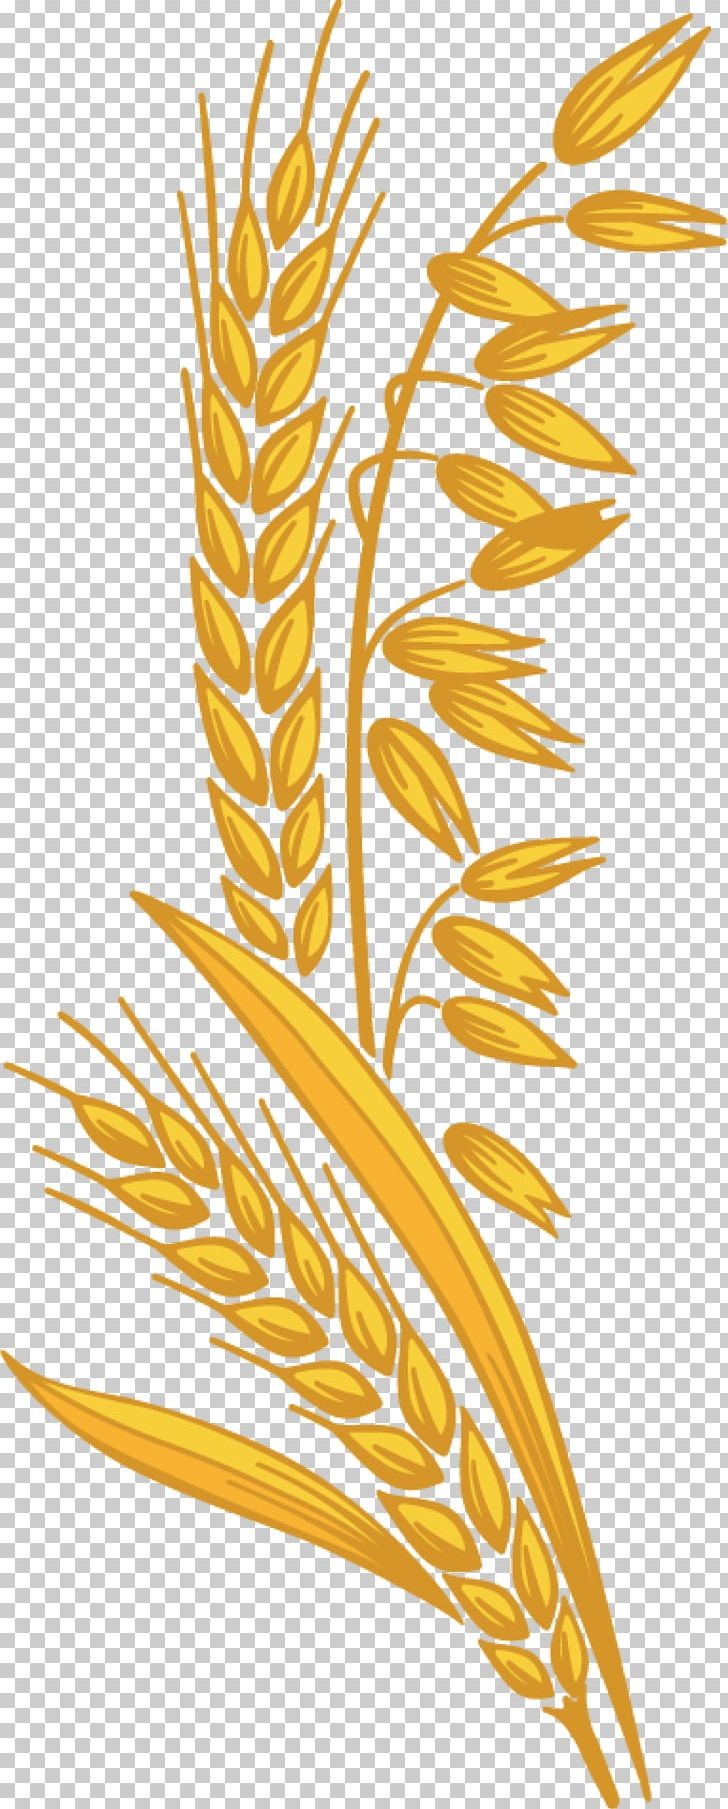 Dietary cereal germ sugar. Grain clipart fiber